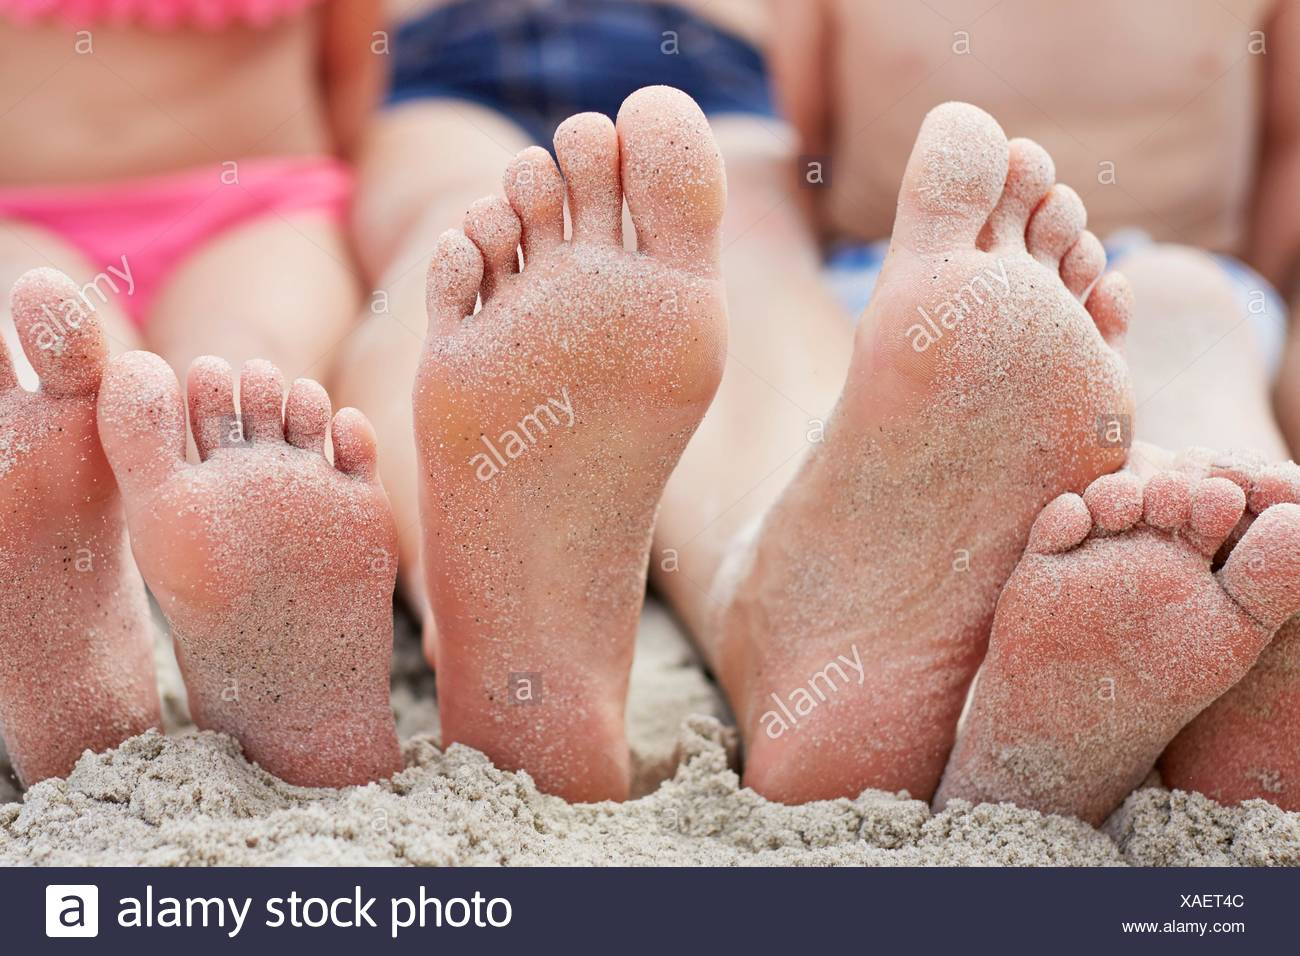 Familie strand nackt Strand Nackt